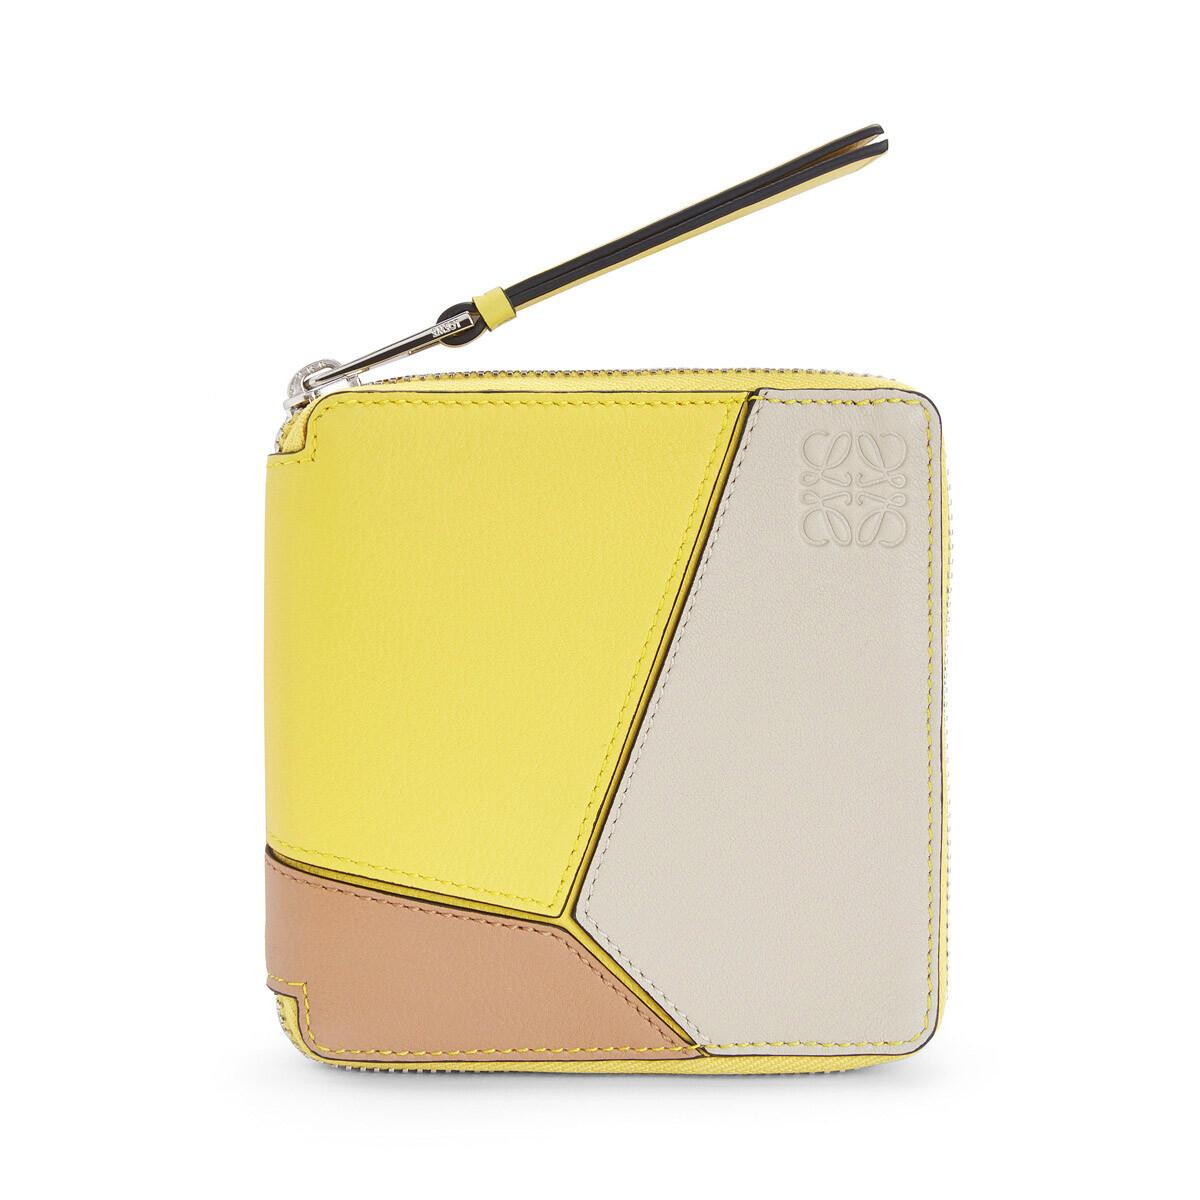 LOEWE Puzzle Square Zip Wallet Yellow/Powder front